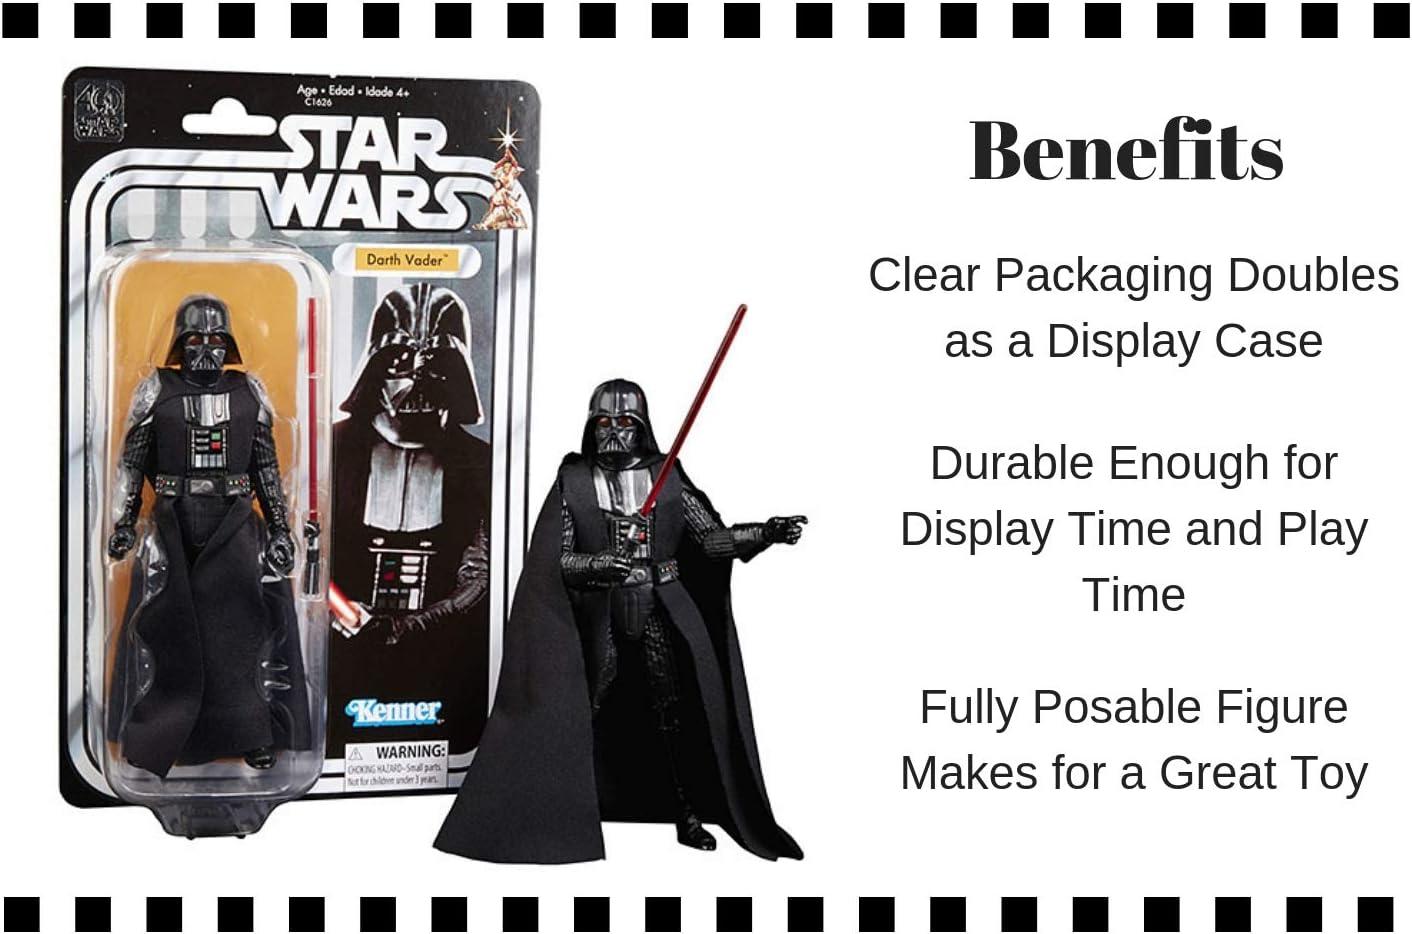 Star Wars Black Series Darth Vader Action Figure Avec Protecteur Précommande ETA Aug